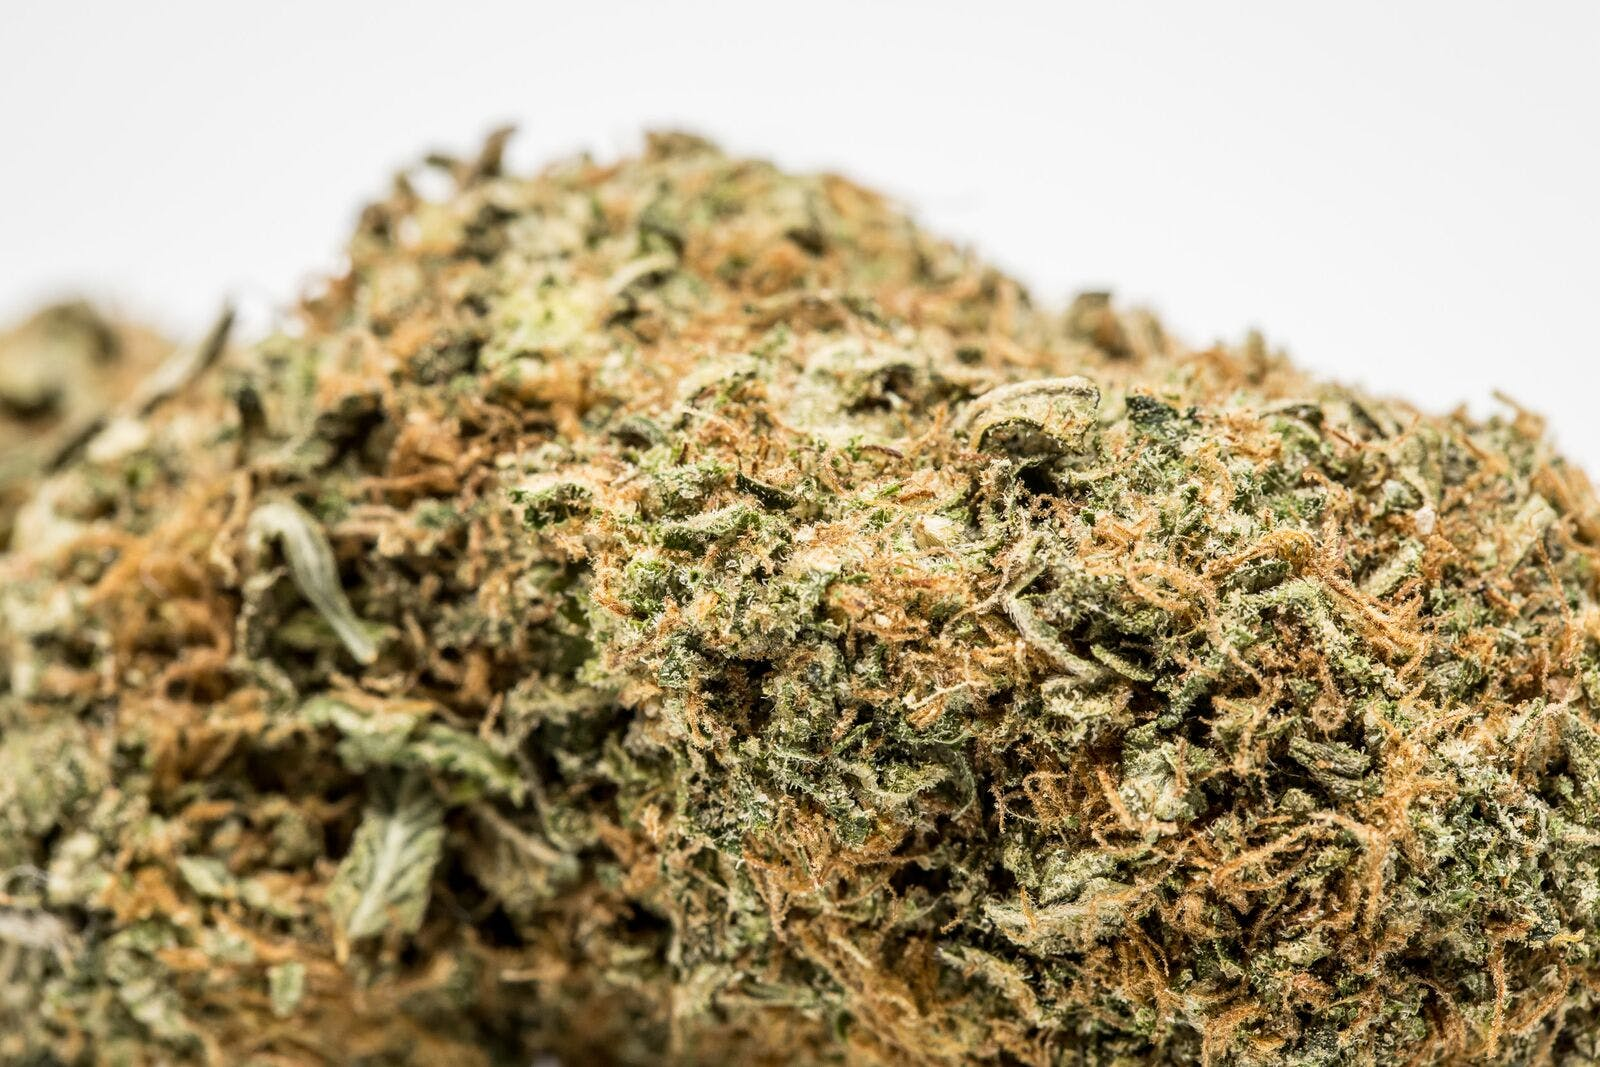 Pink Lemonade Weed; Pink Lemonade Cannabis Strain; Pink Lemonade Hybrid Marijuana Strain